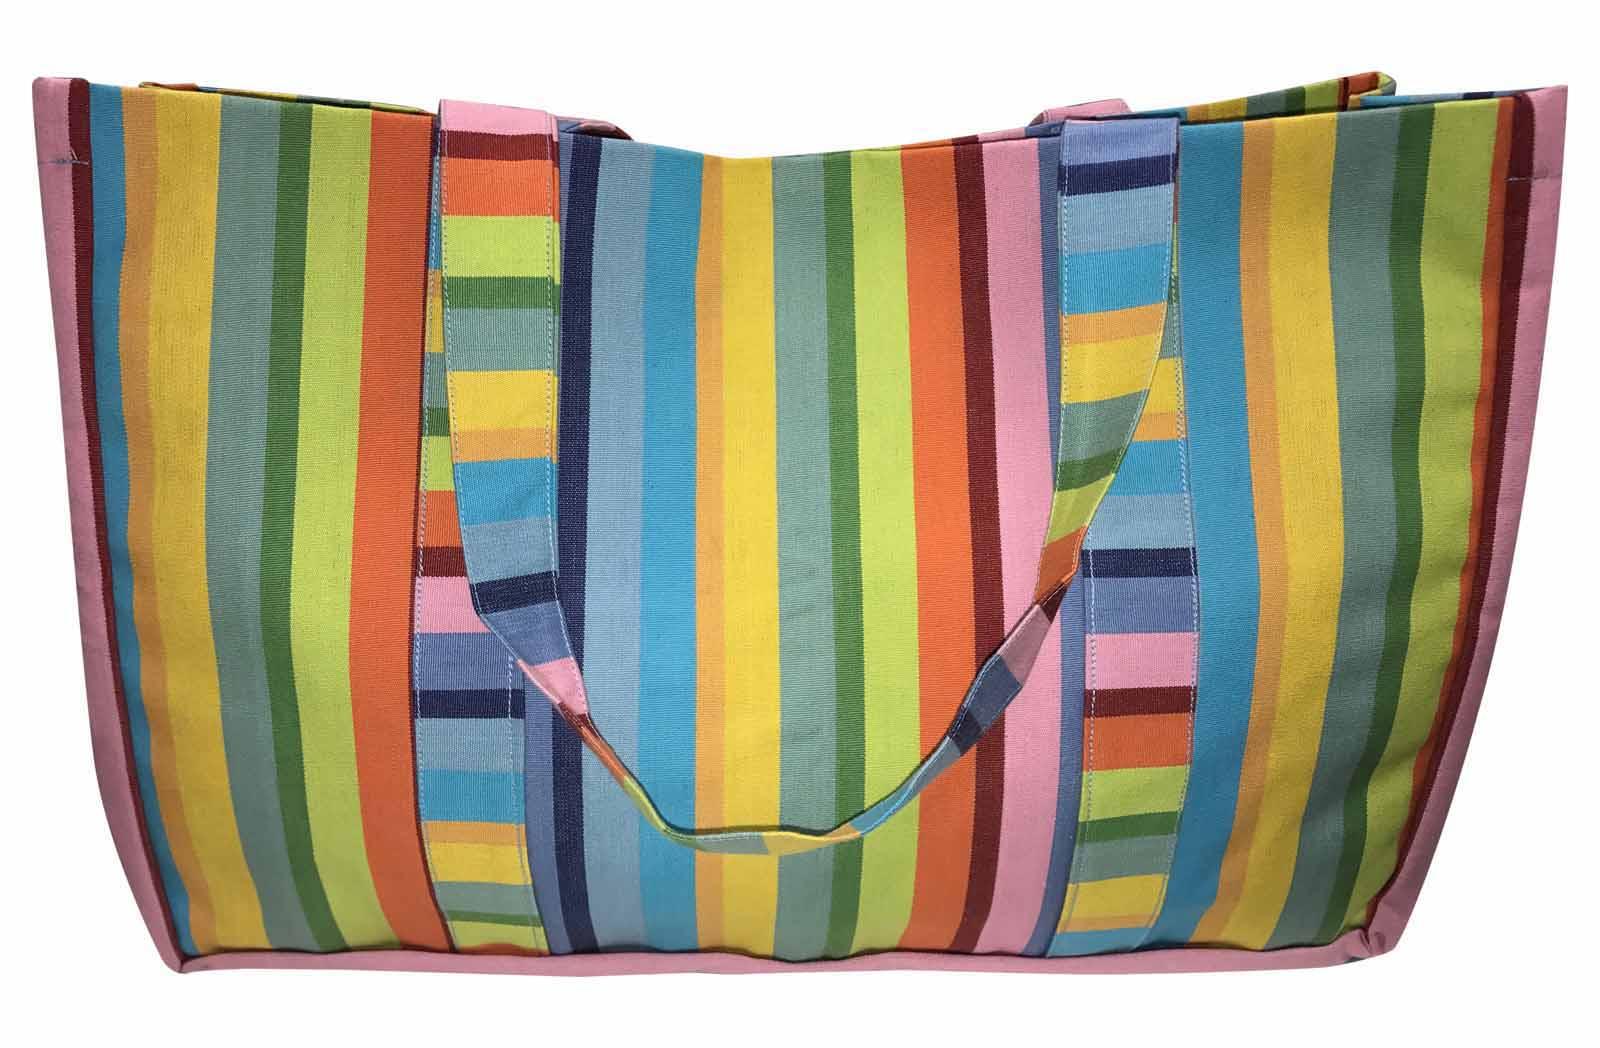 Extra Large Beach Bags Rainbow Stripes | The Stripes Company UK